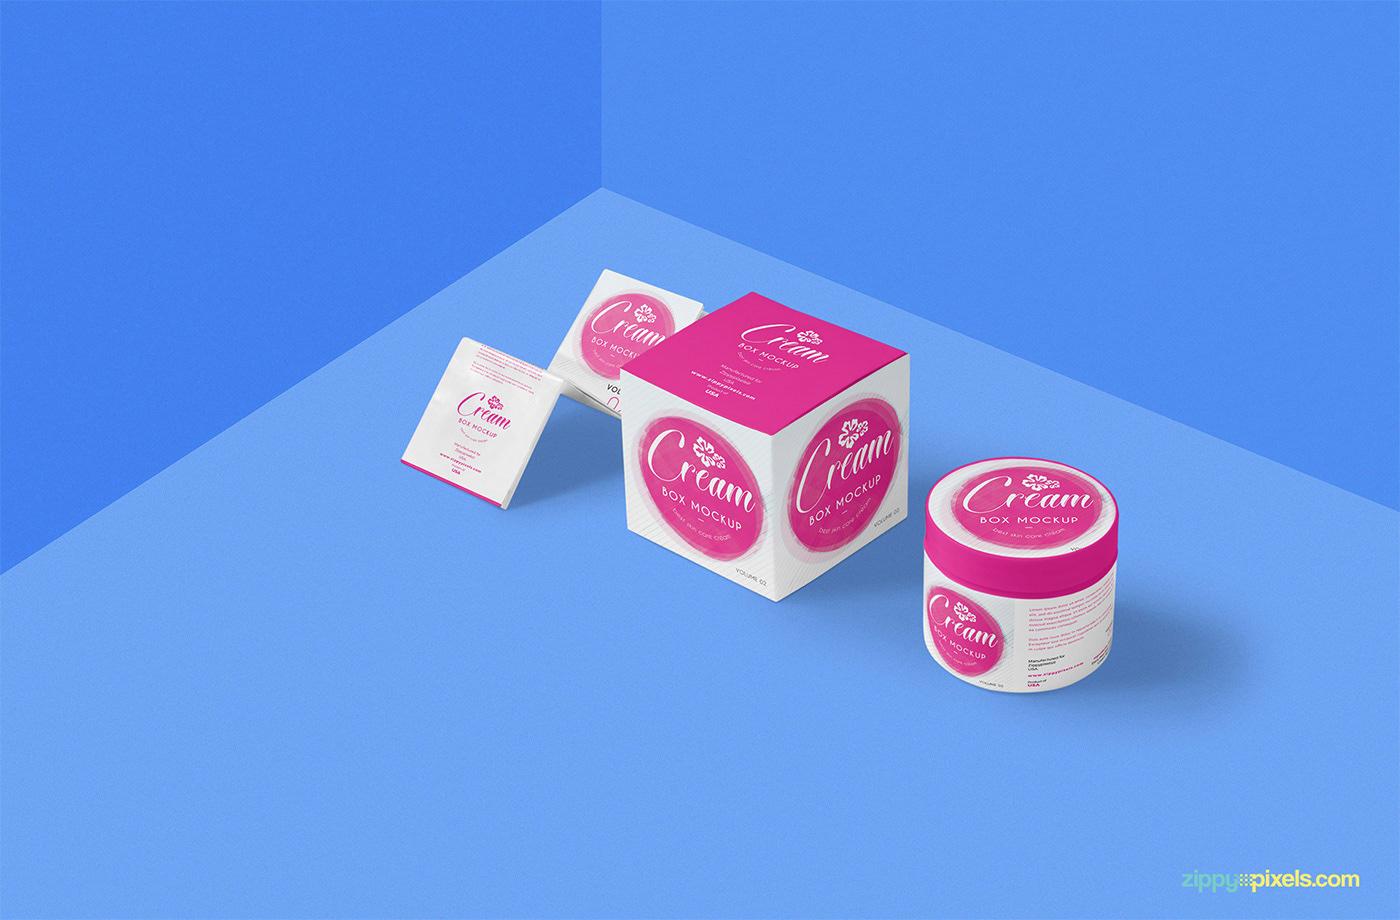 free freebie Mockup psd photoshop Packaging cream Cosmetic pot jar